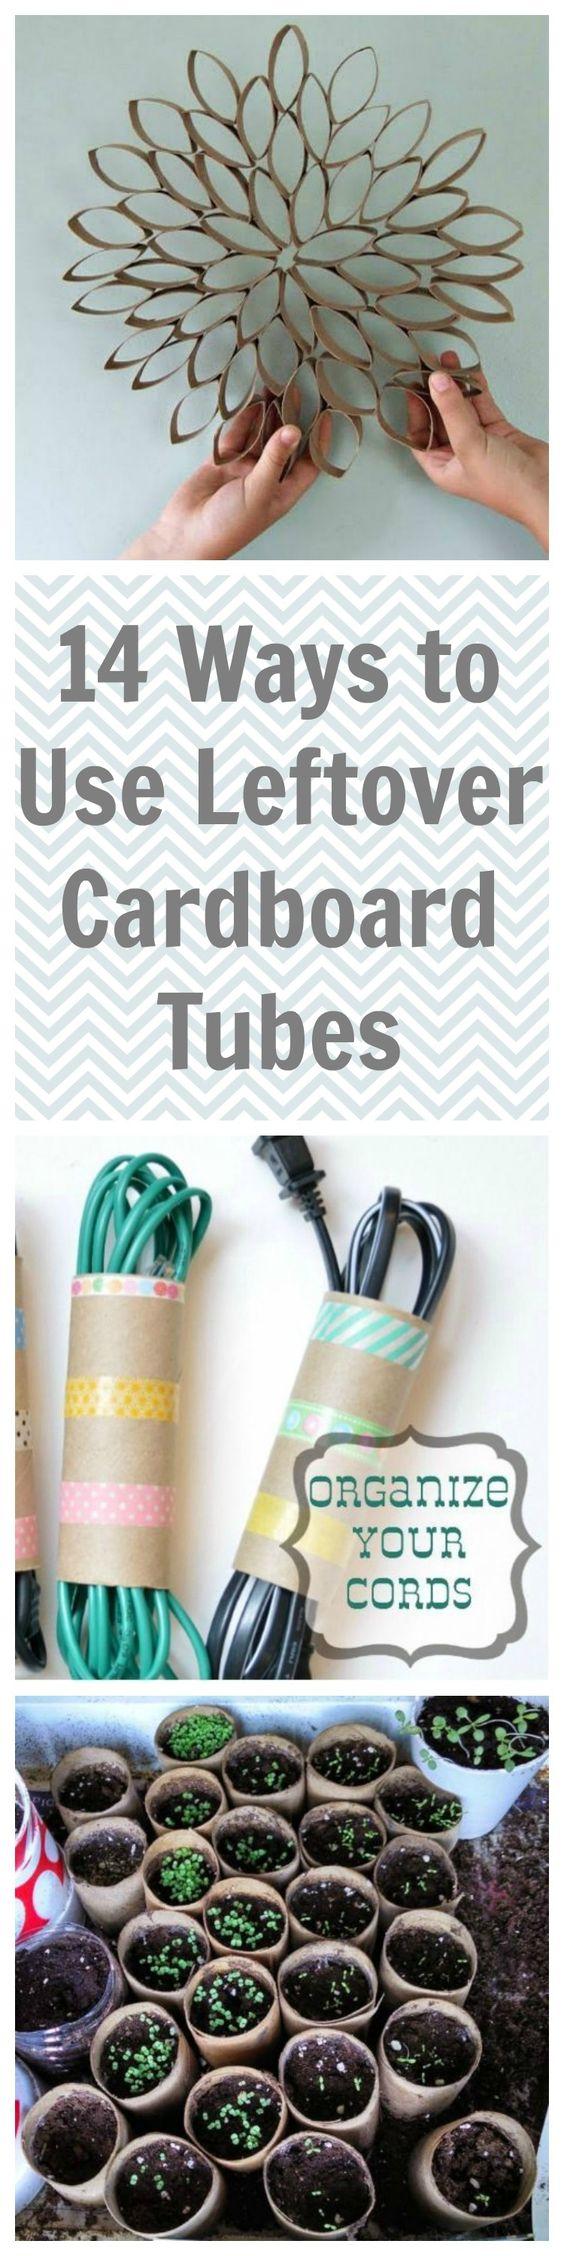 14 Brilliant Ways to Use Leftover Cardboard Tubes